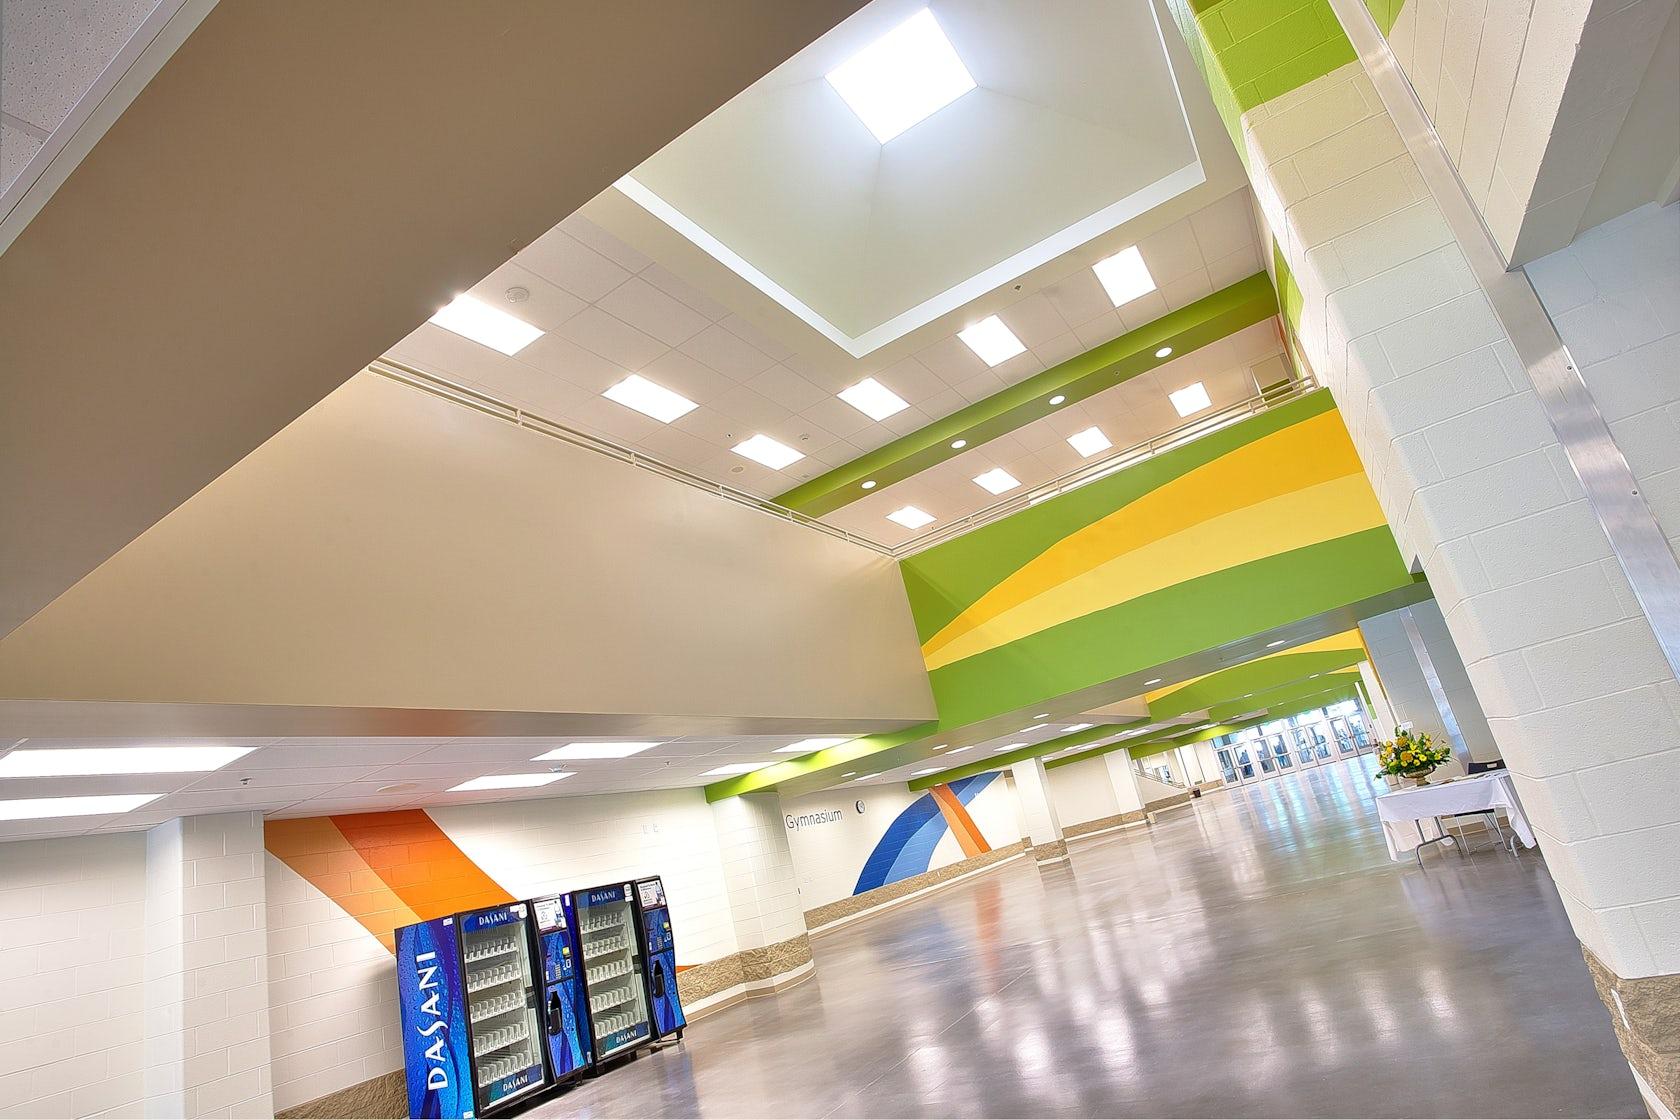 interior design firms in orlando fl interior design firms orlando